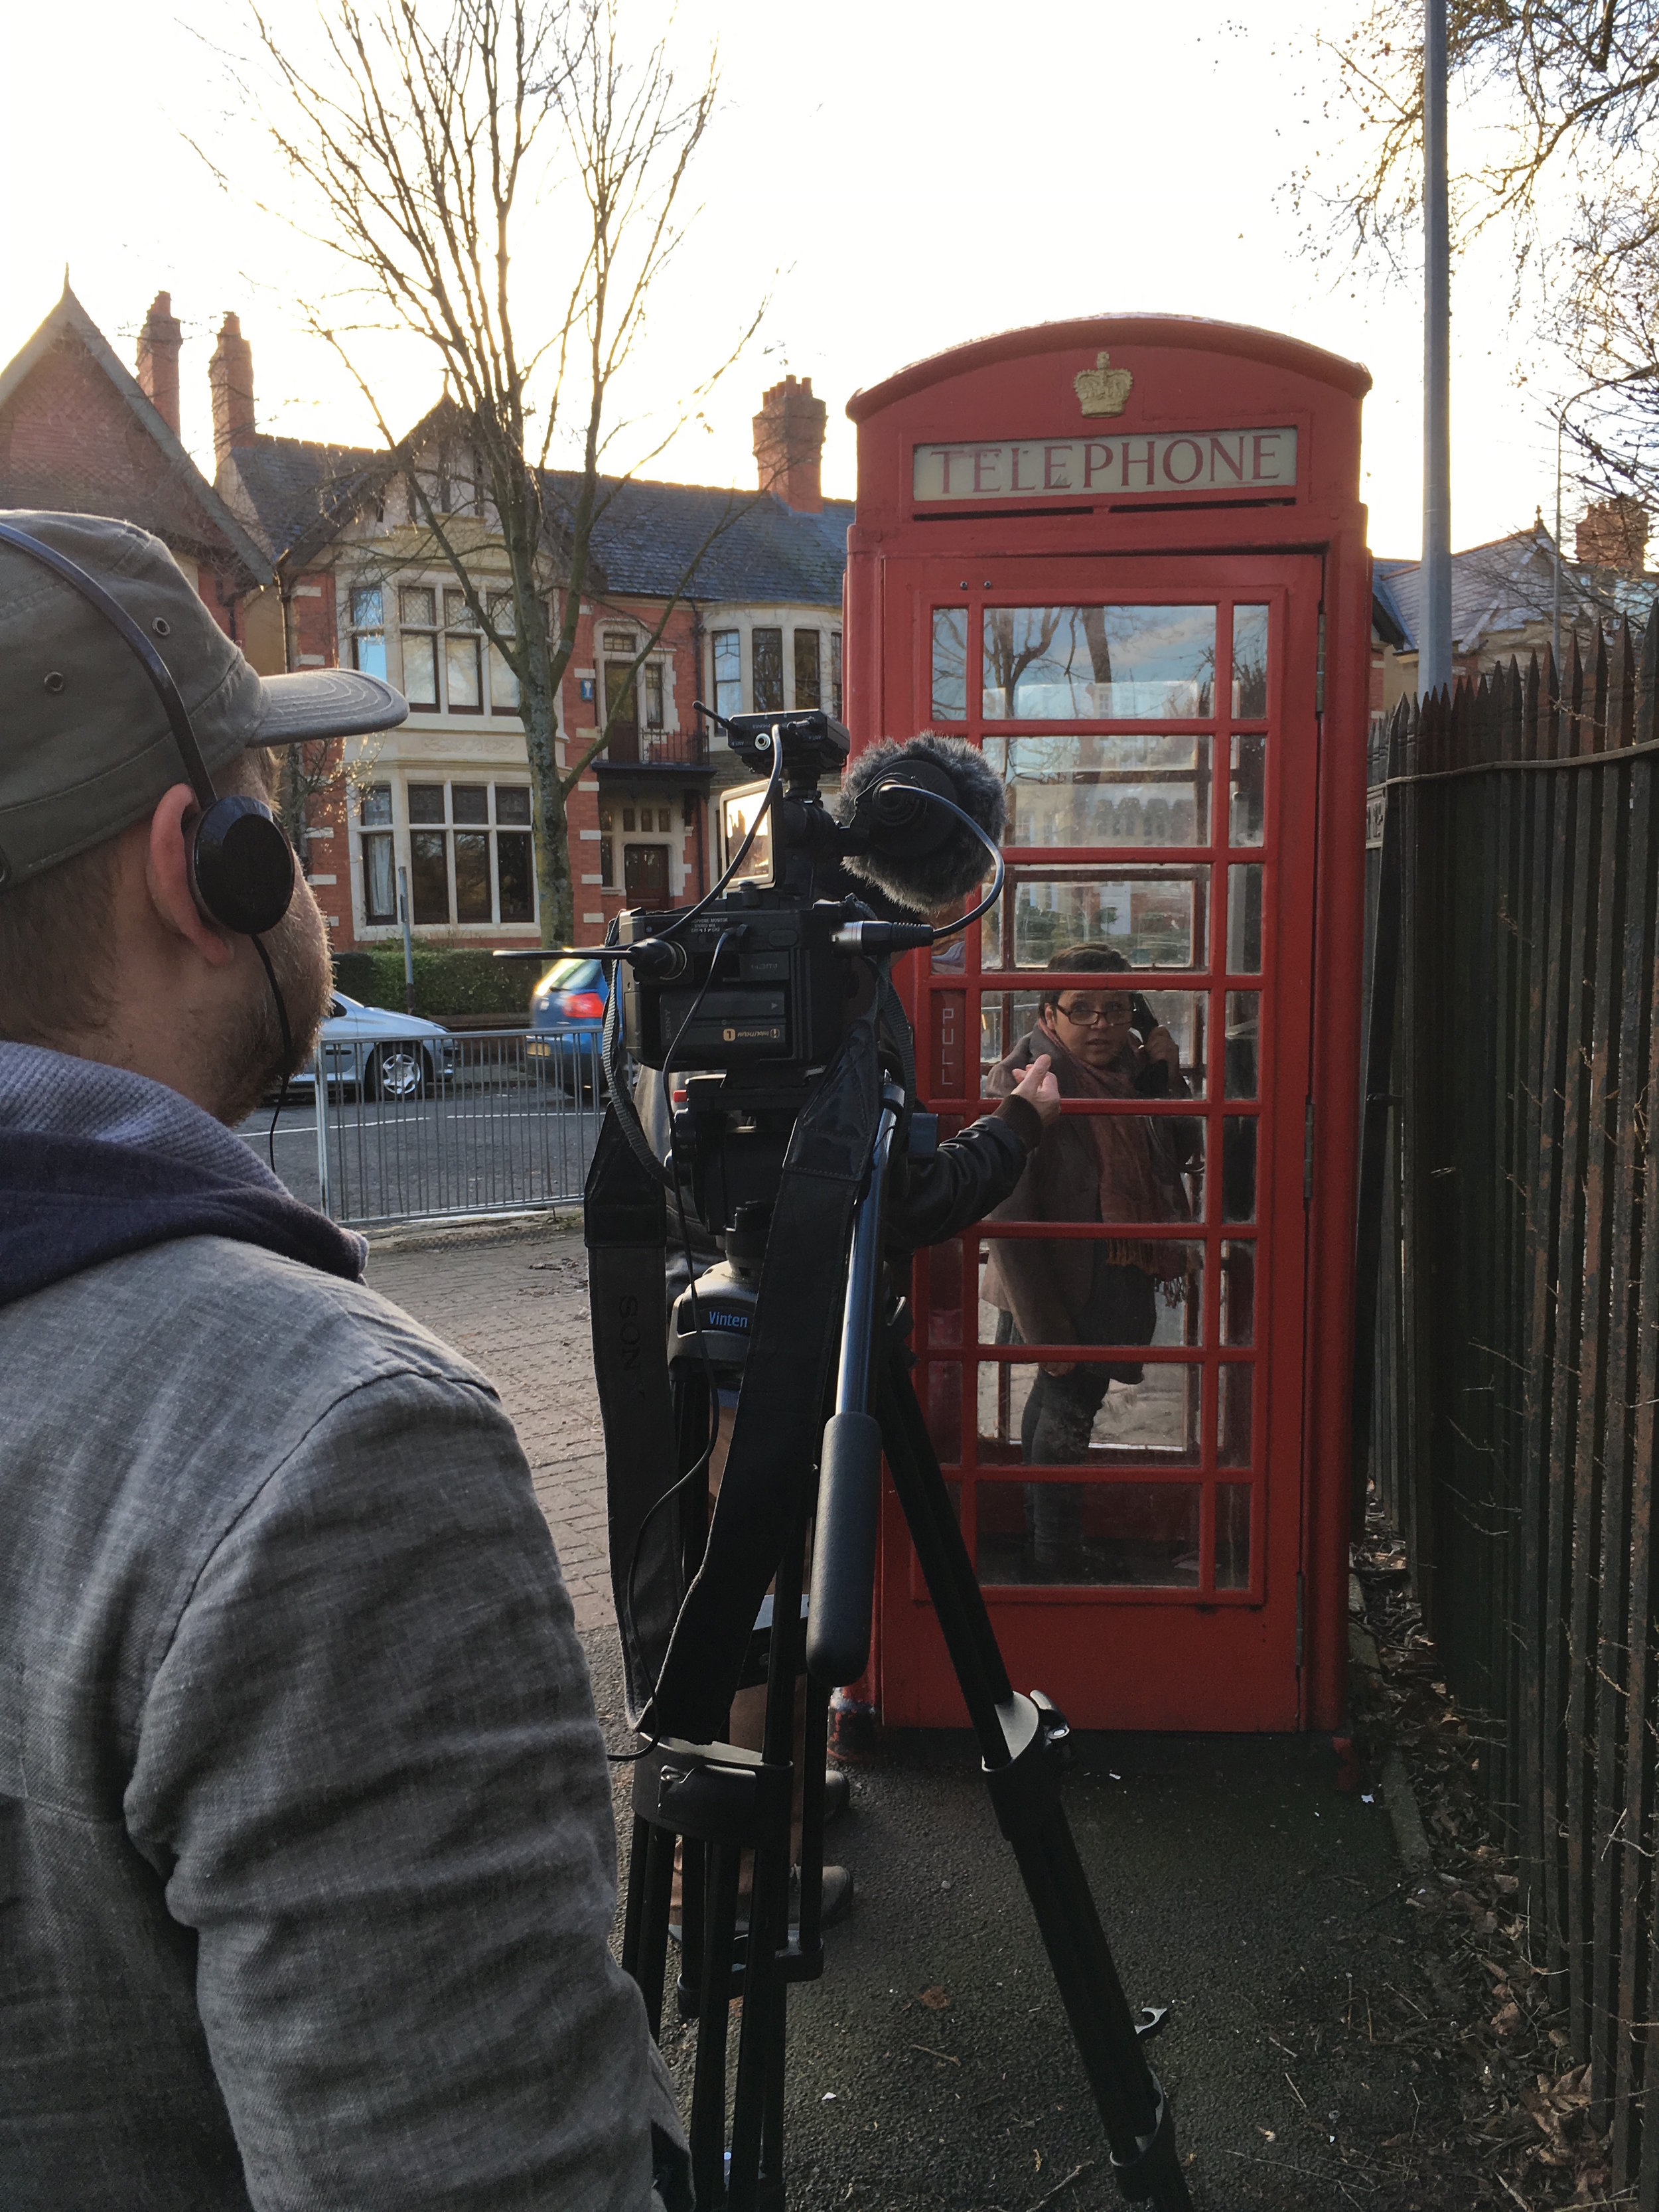 Video phone booth shoot 2.jpg